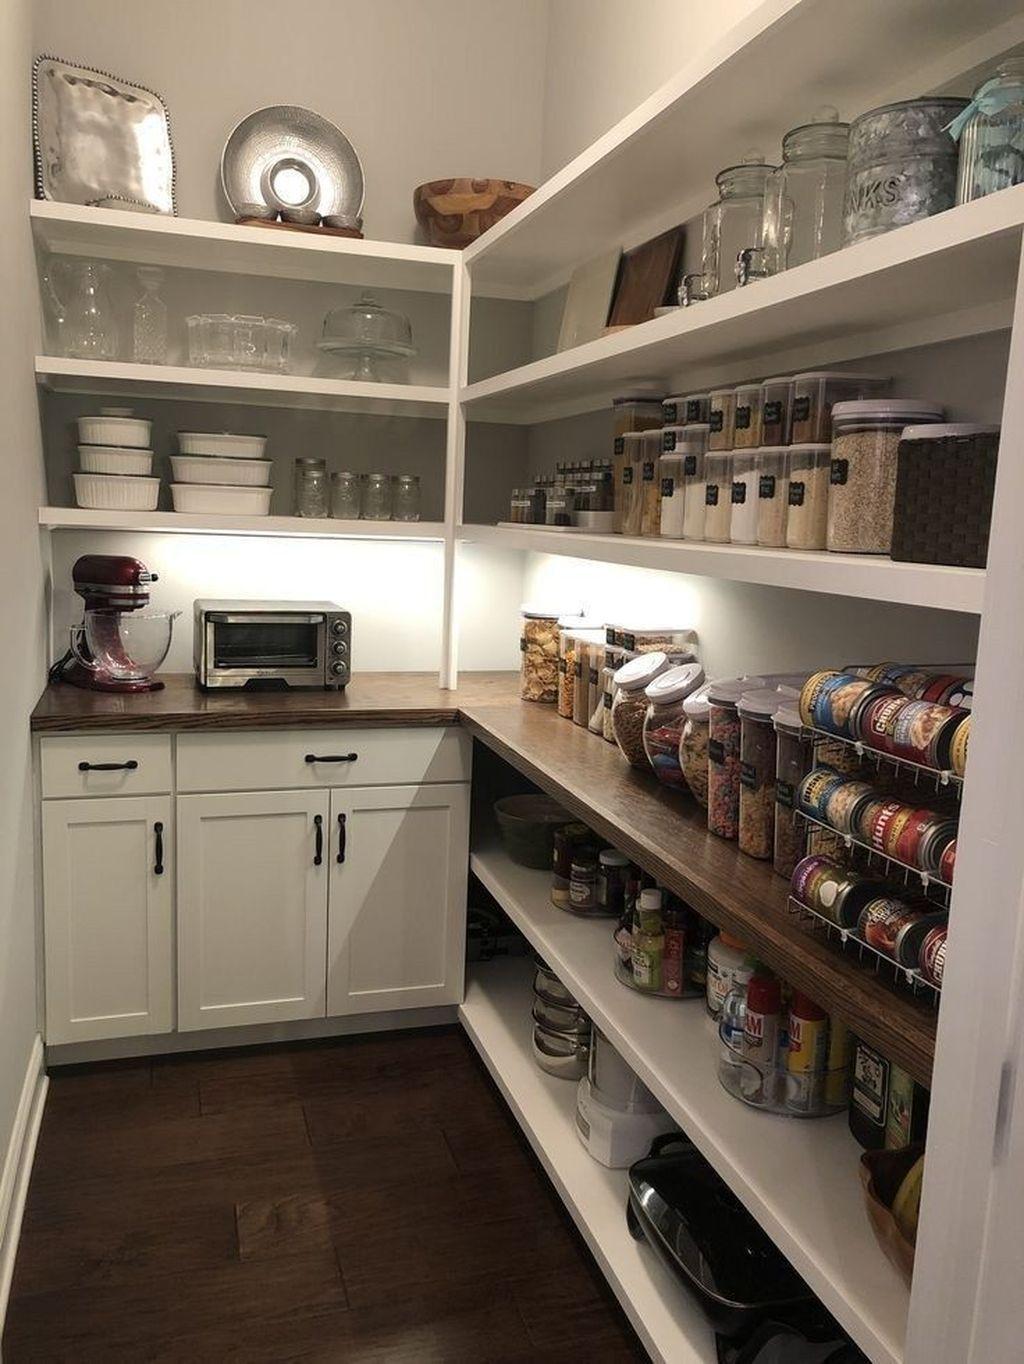 36 The Best Kitchen Storage Ideas For More Space #kitchenpantries